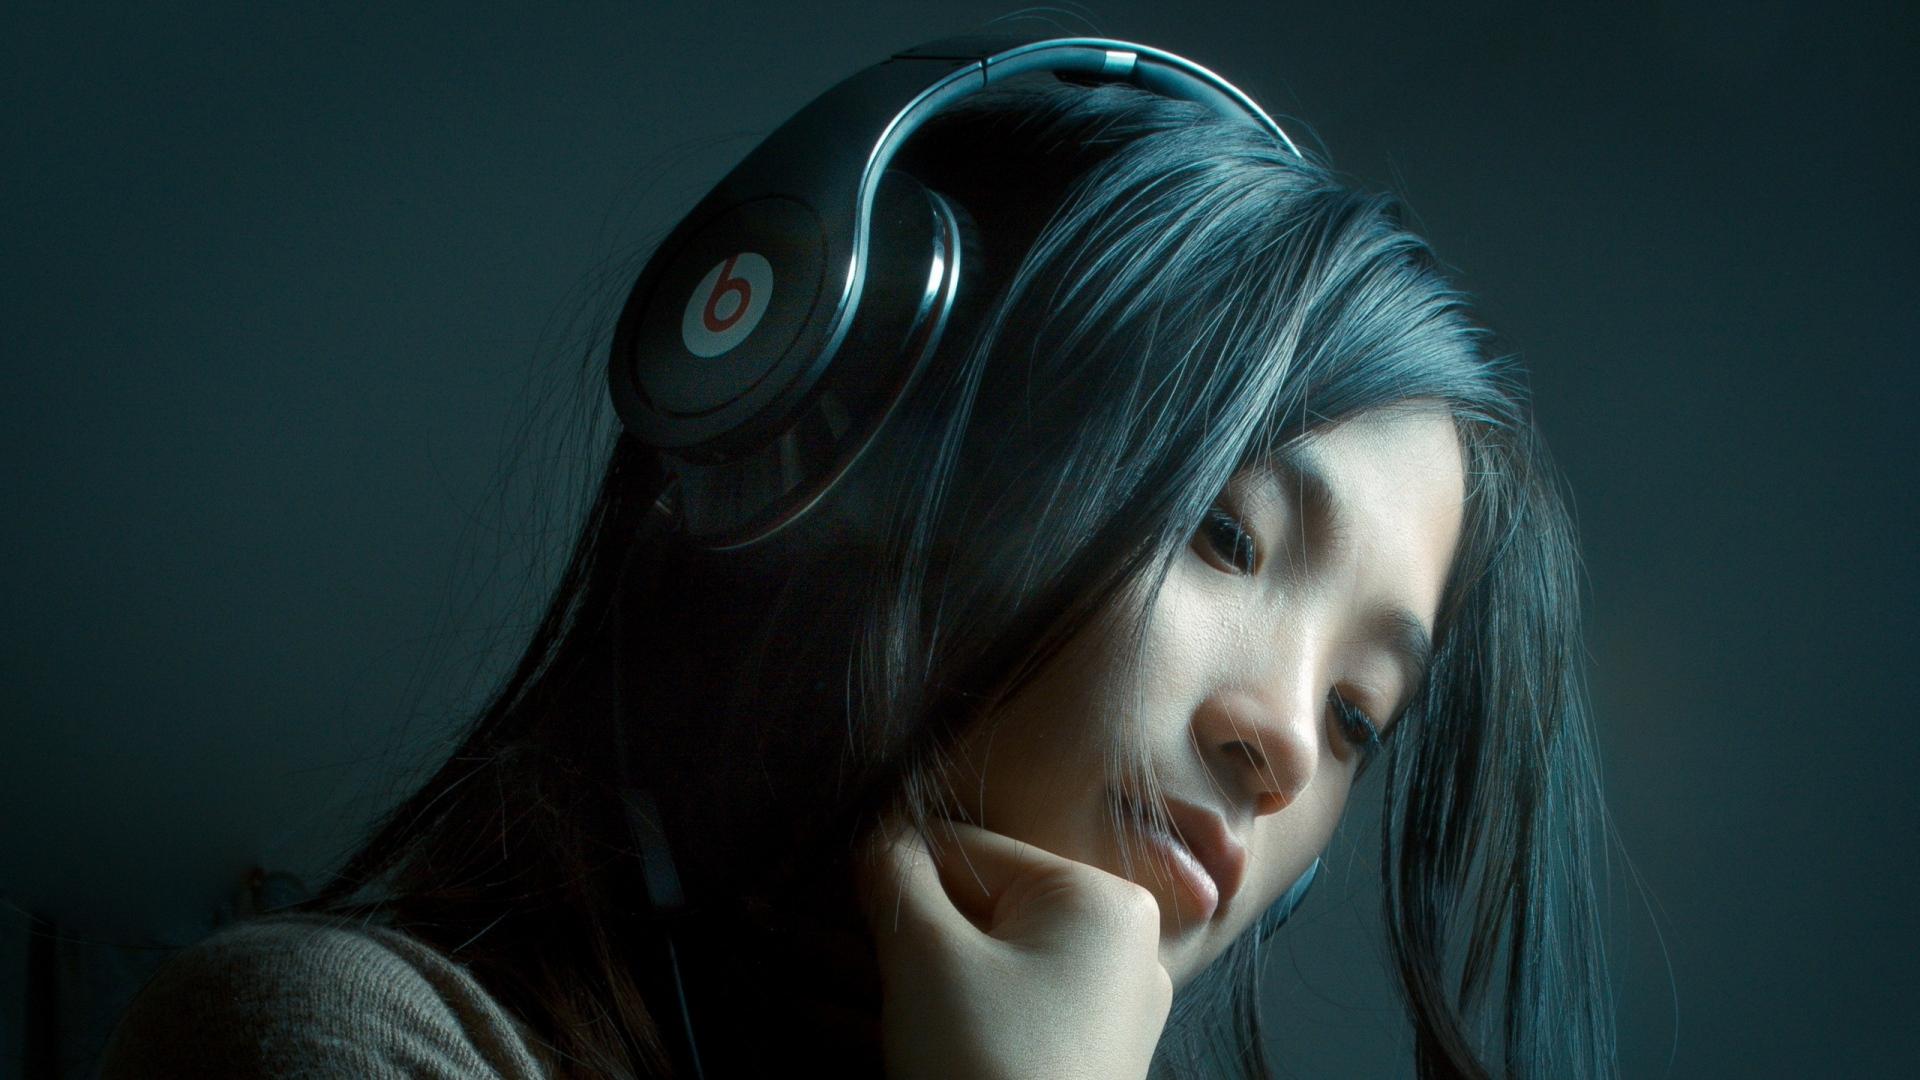 beats audio wallpaper download